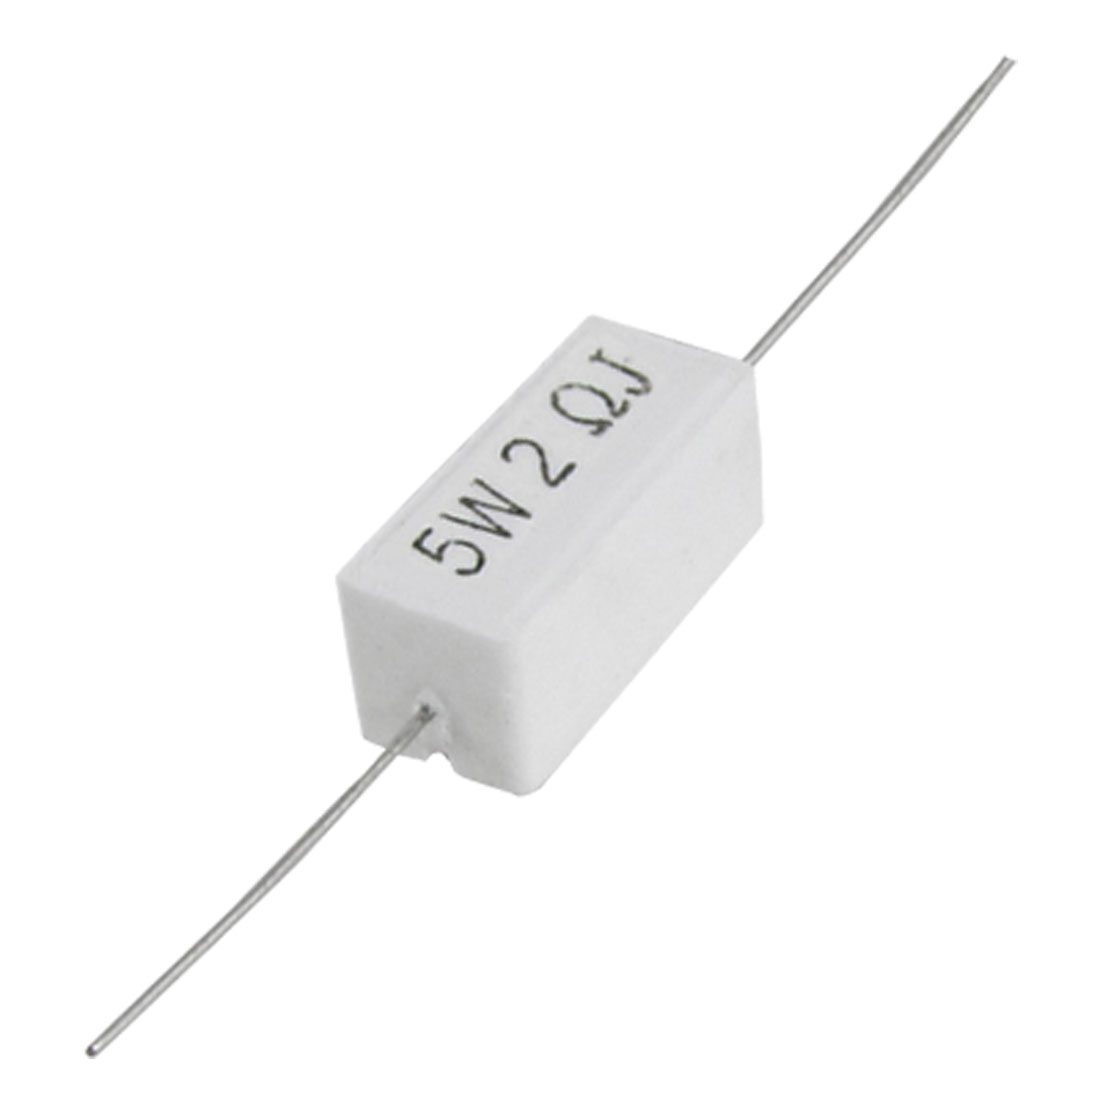 10 Pcs 5W Watt 2 Ohm 5% Wire Wound Ceramic Cement Resistors